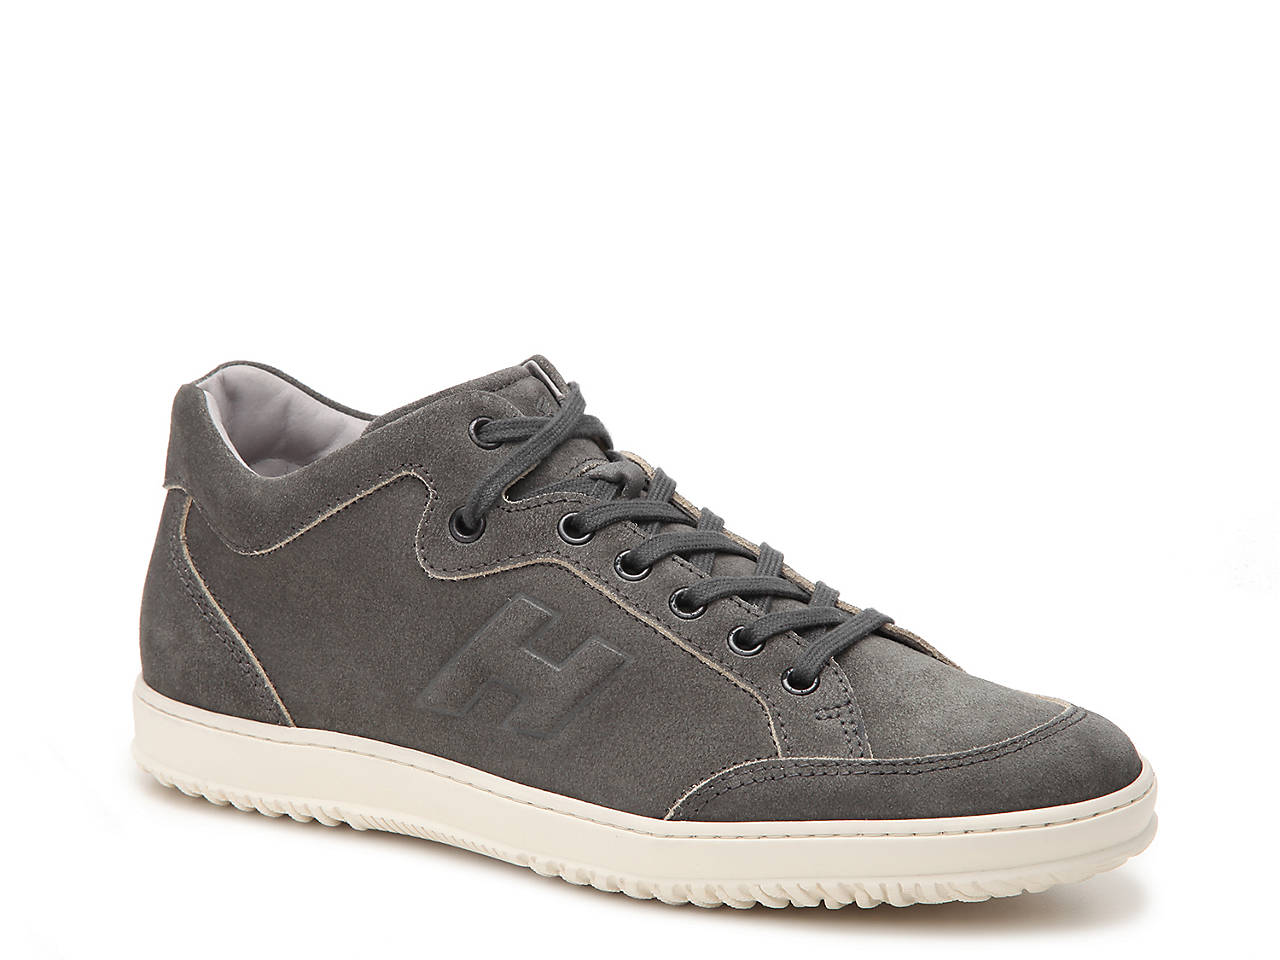 Comfortable Amazon Cheap Online Hogan Suede Logo Sneakers Genuine Get Authentic For Sale Qw9lHyv